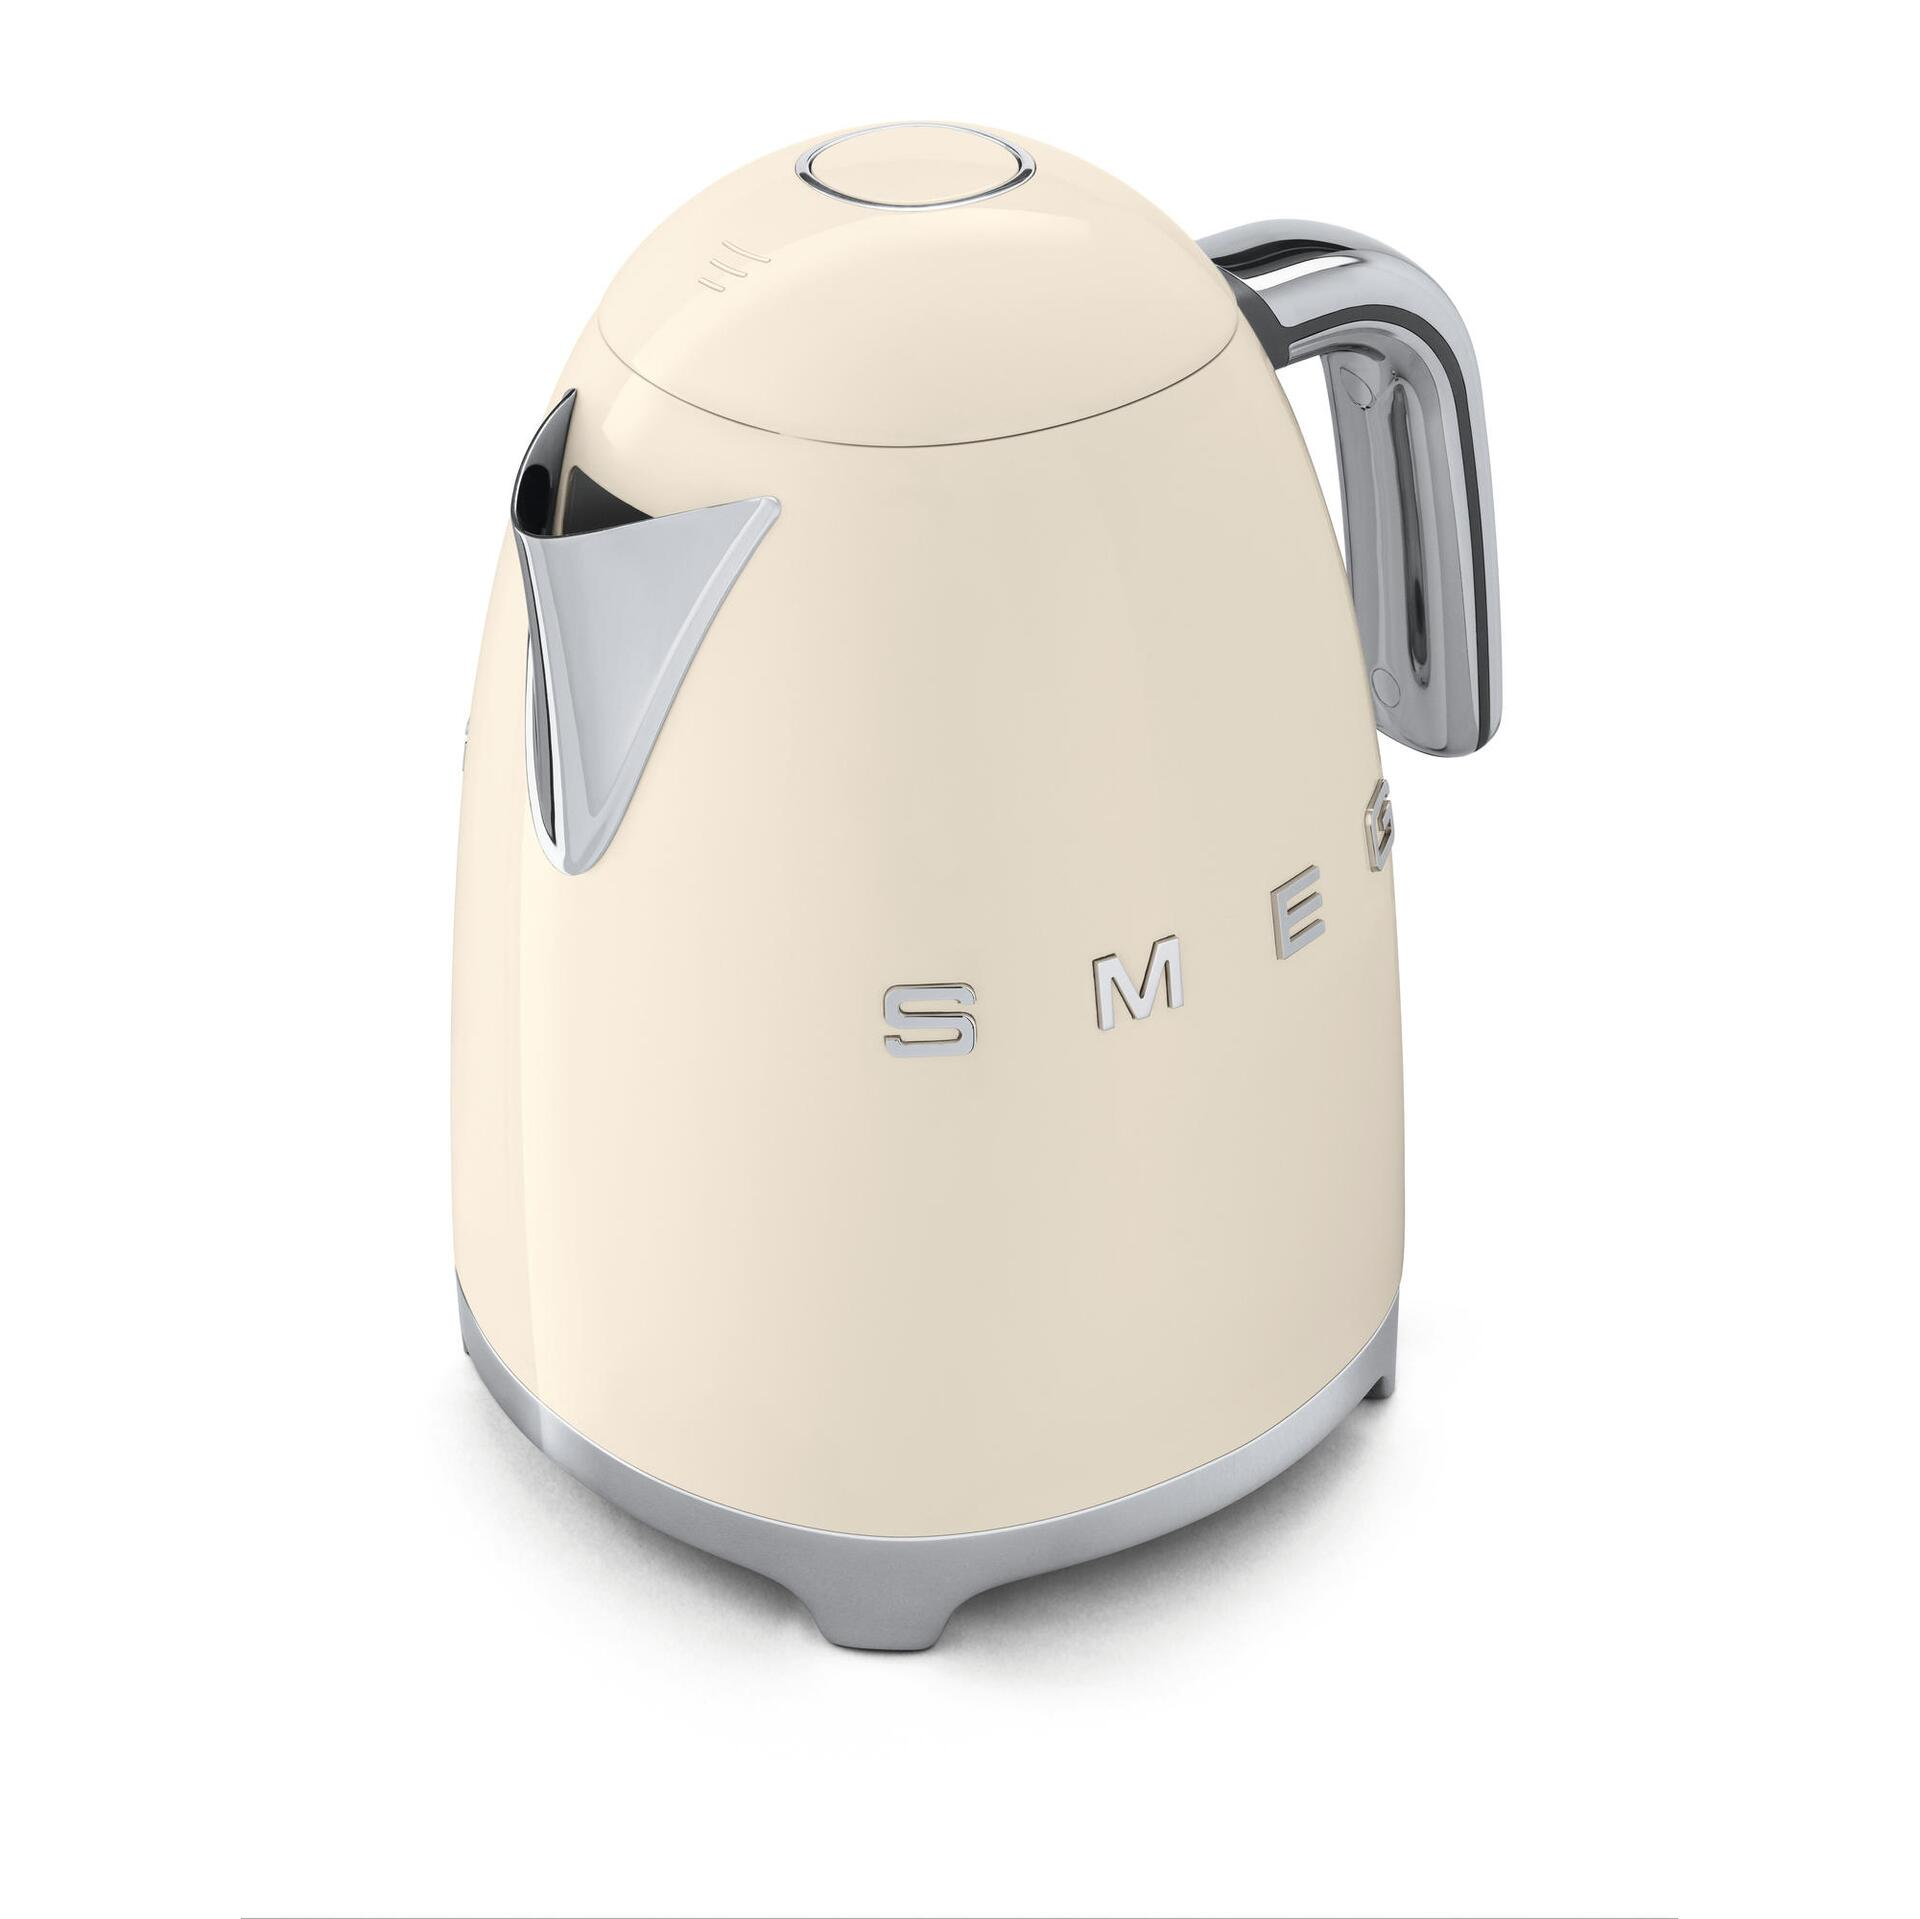 Smeg Retro Wasserkocher 1,7 Liter Creme